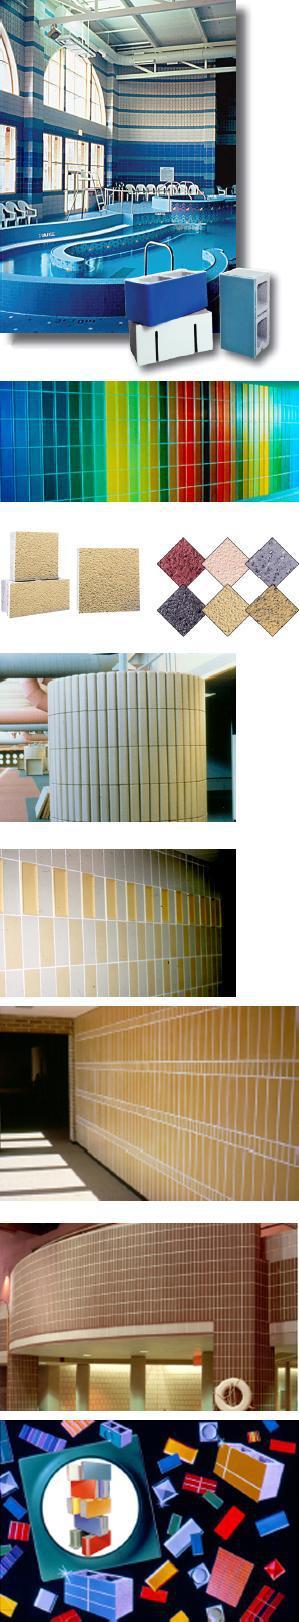 Glazed Cinder Blocks : Spectra glaze glazed concrete block group